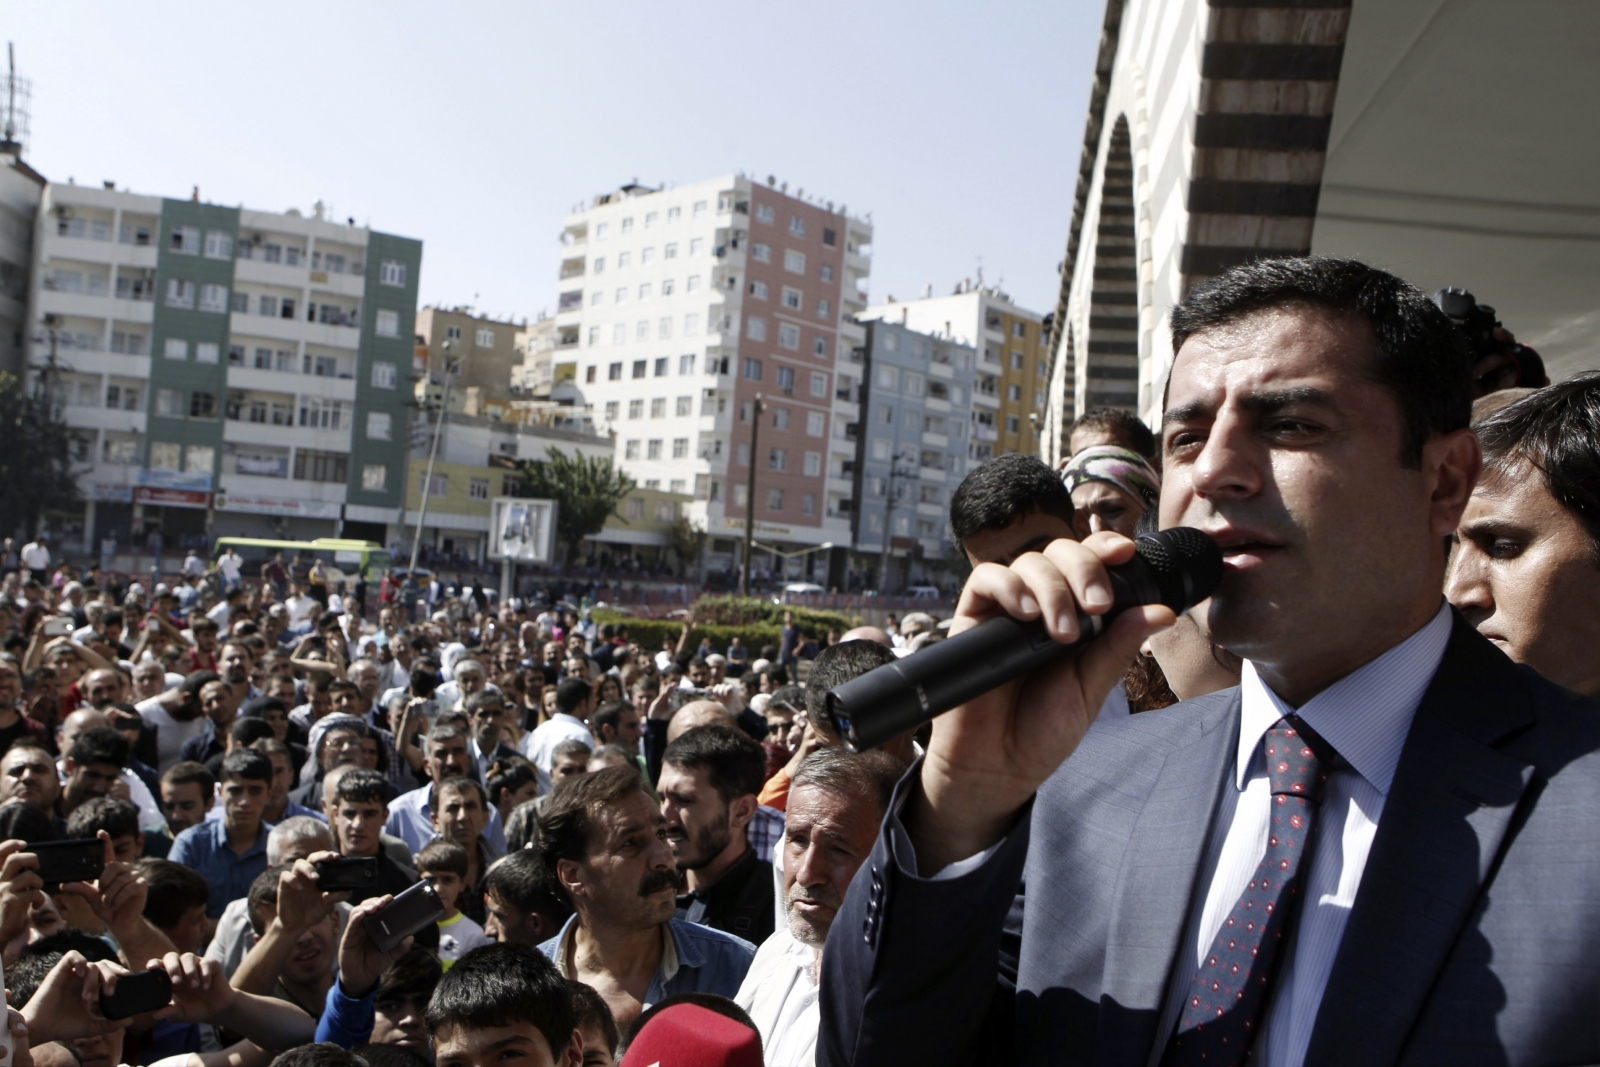 Selahattin Demirtas, co-chair of the HDP, Turkeys leading Kurdish party